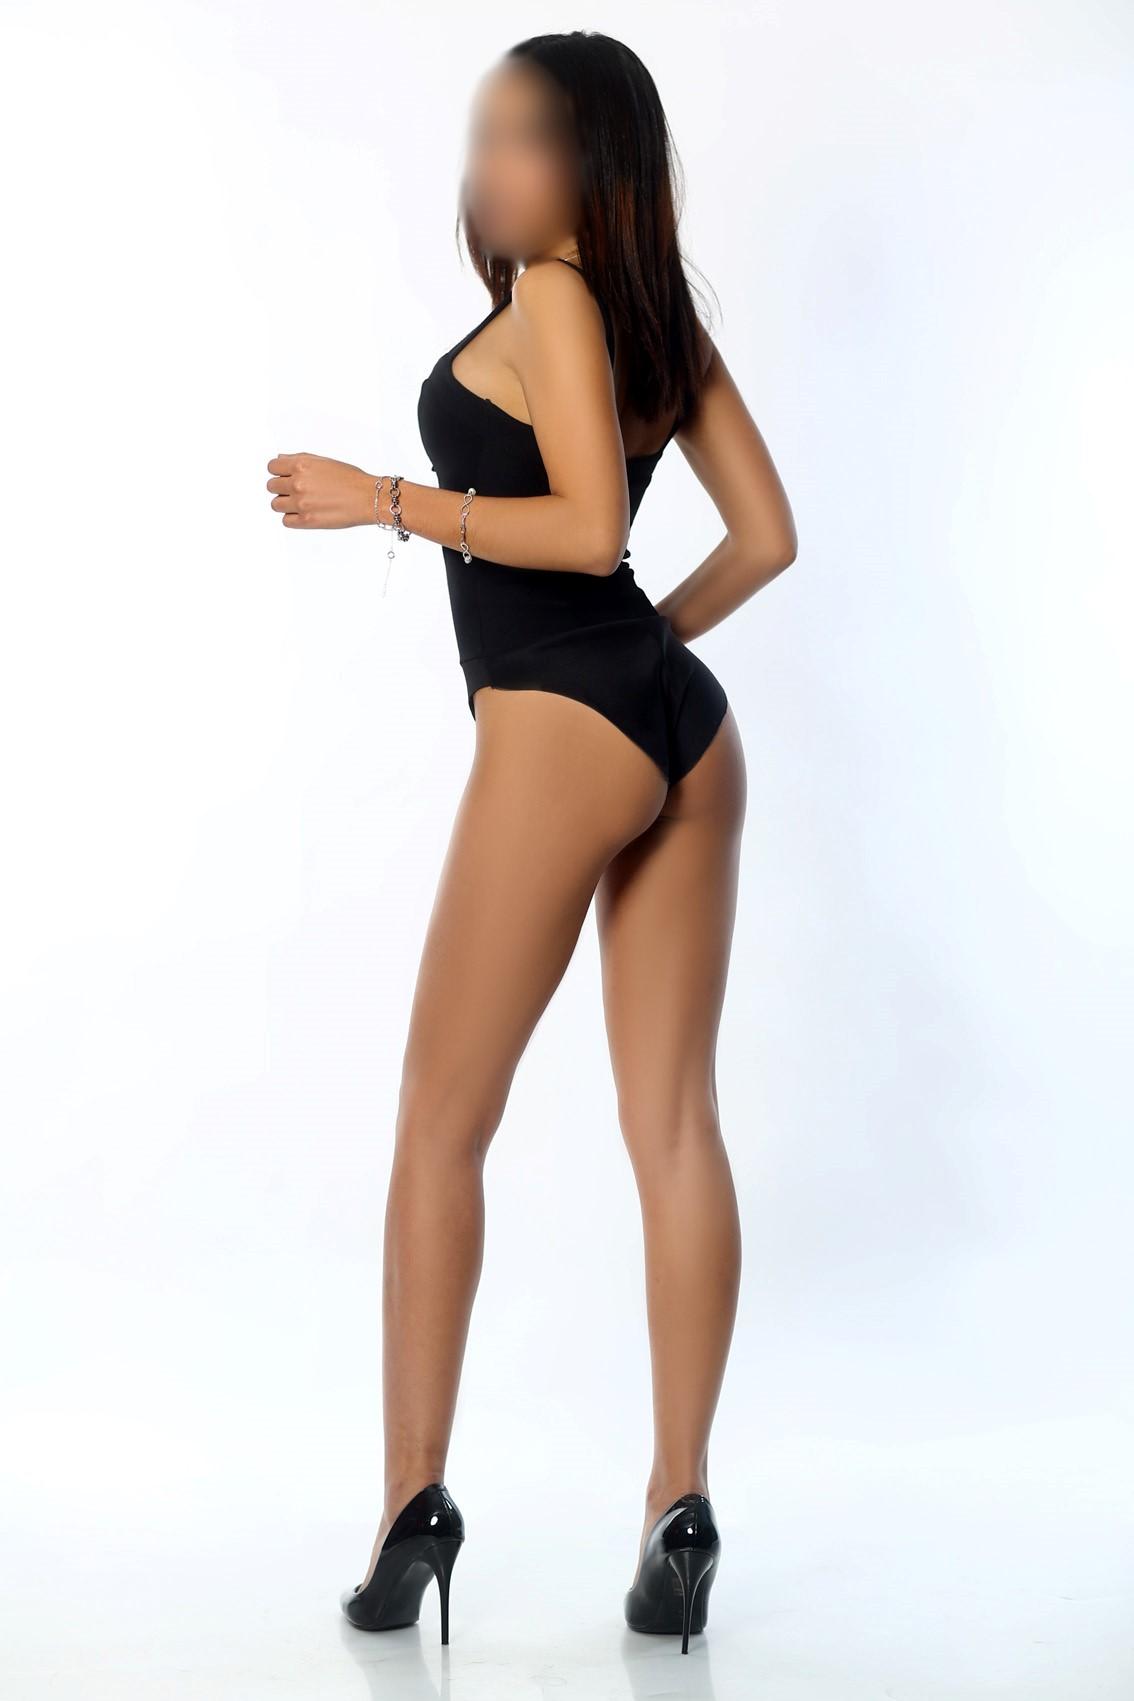 Monica09052018-4